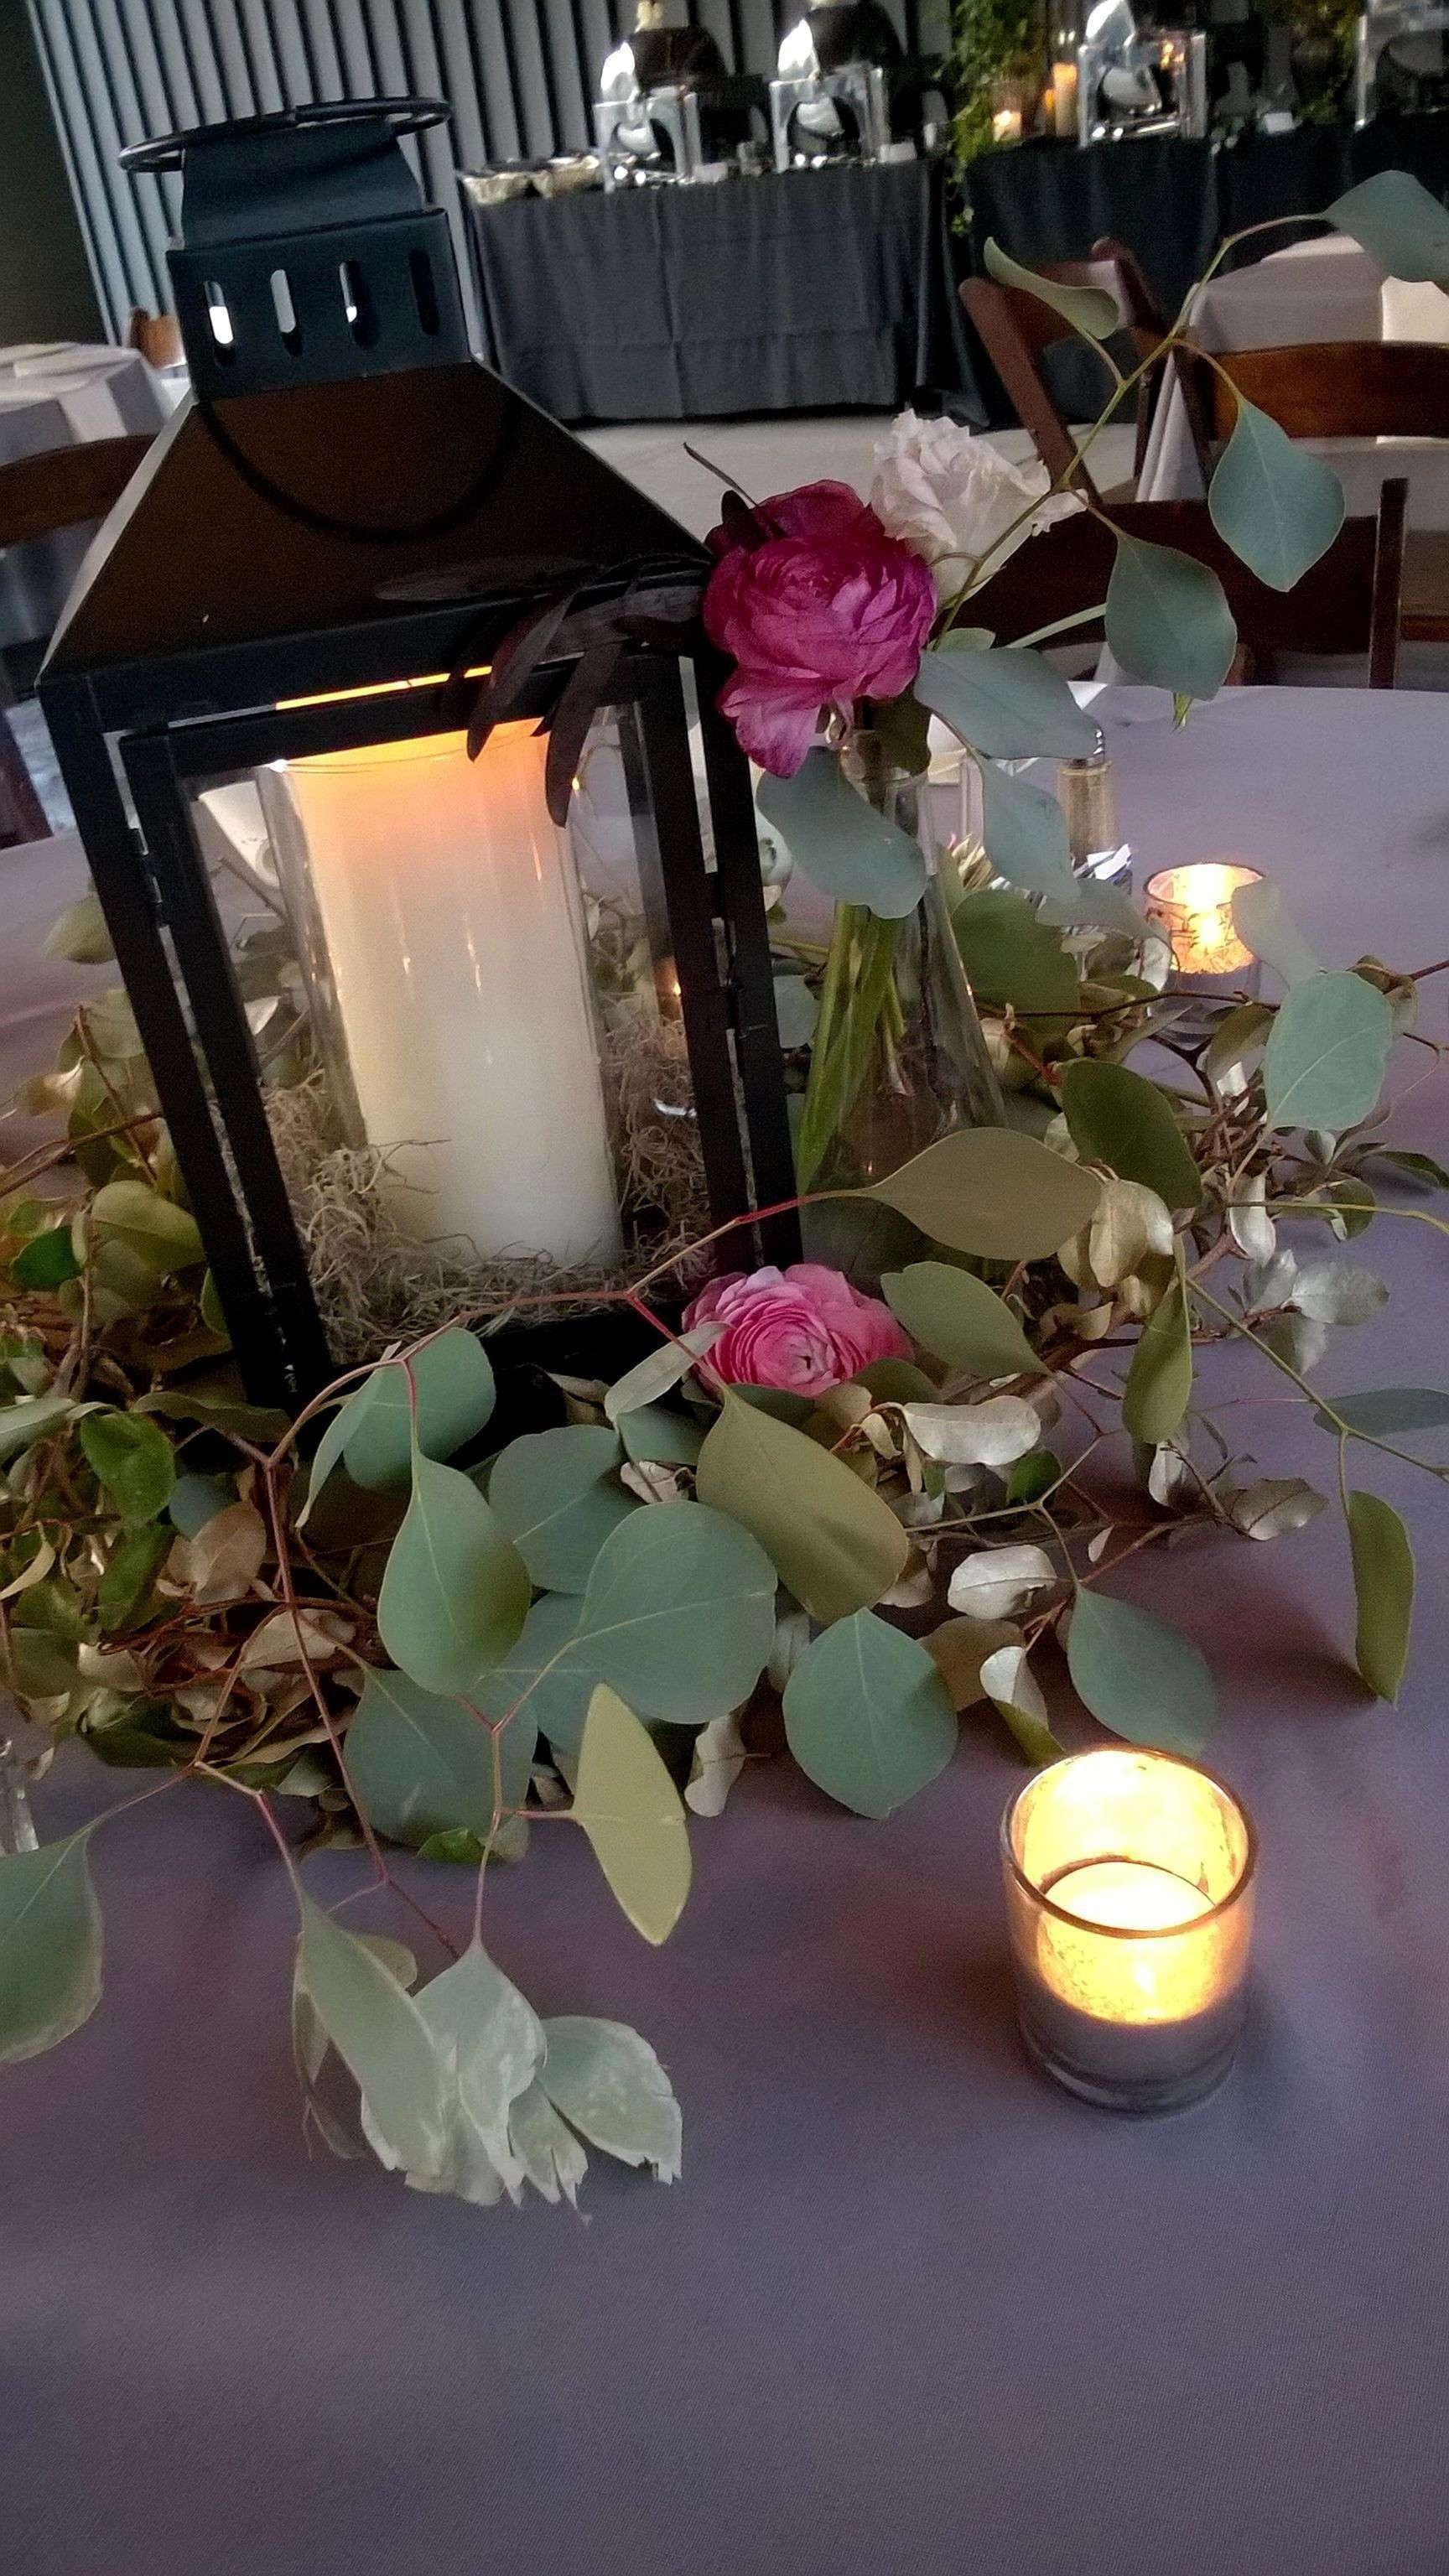 lily shaped vase of 19 best of flower arrangements on a budget flower decoration ideas inside flower arrangements on a budget unique easy wedding decorations new i pinimg originals 0d 55 ee